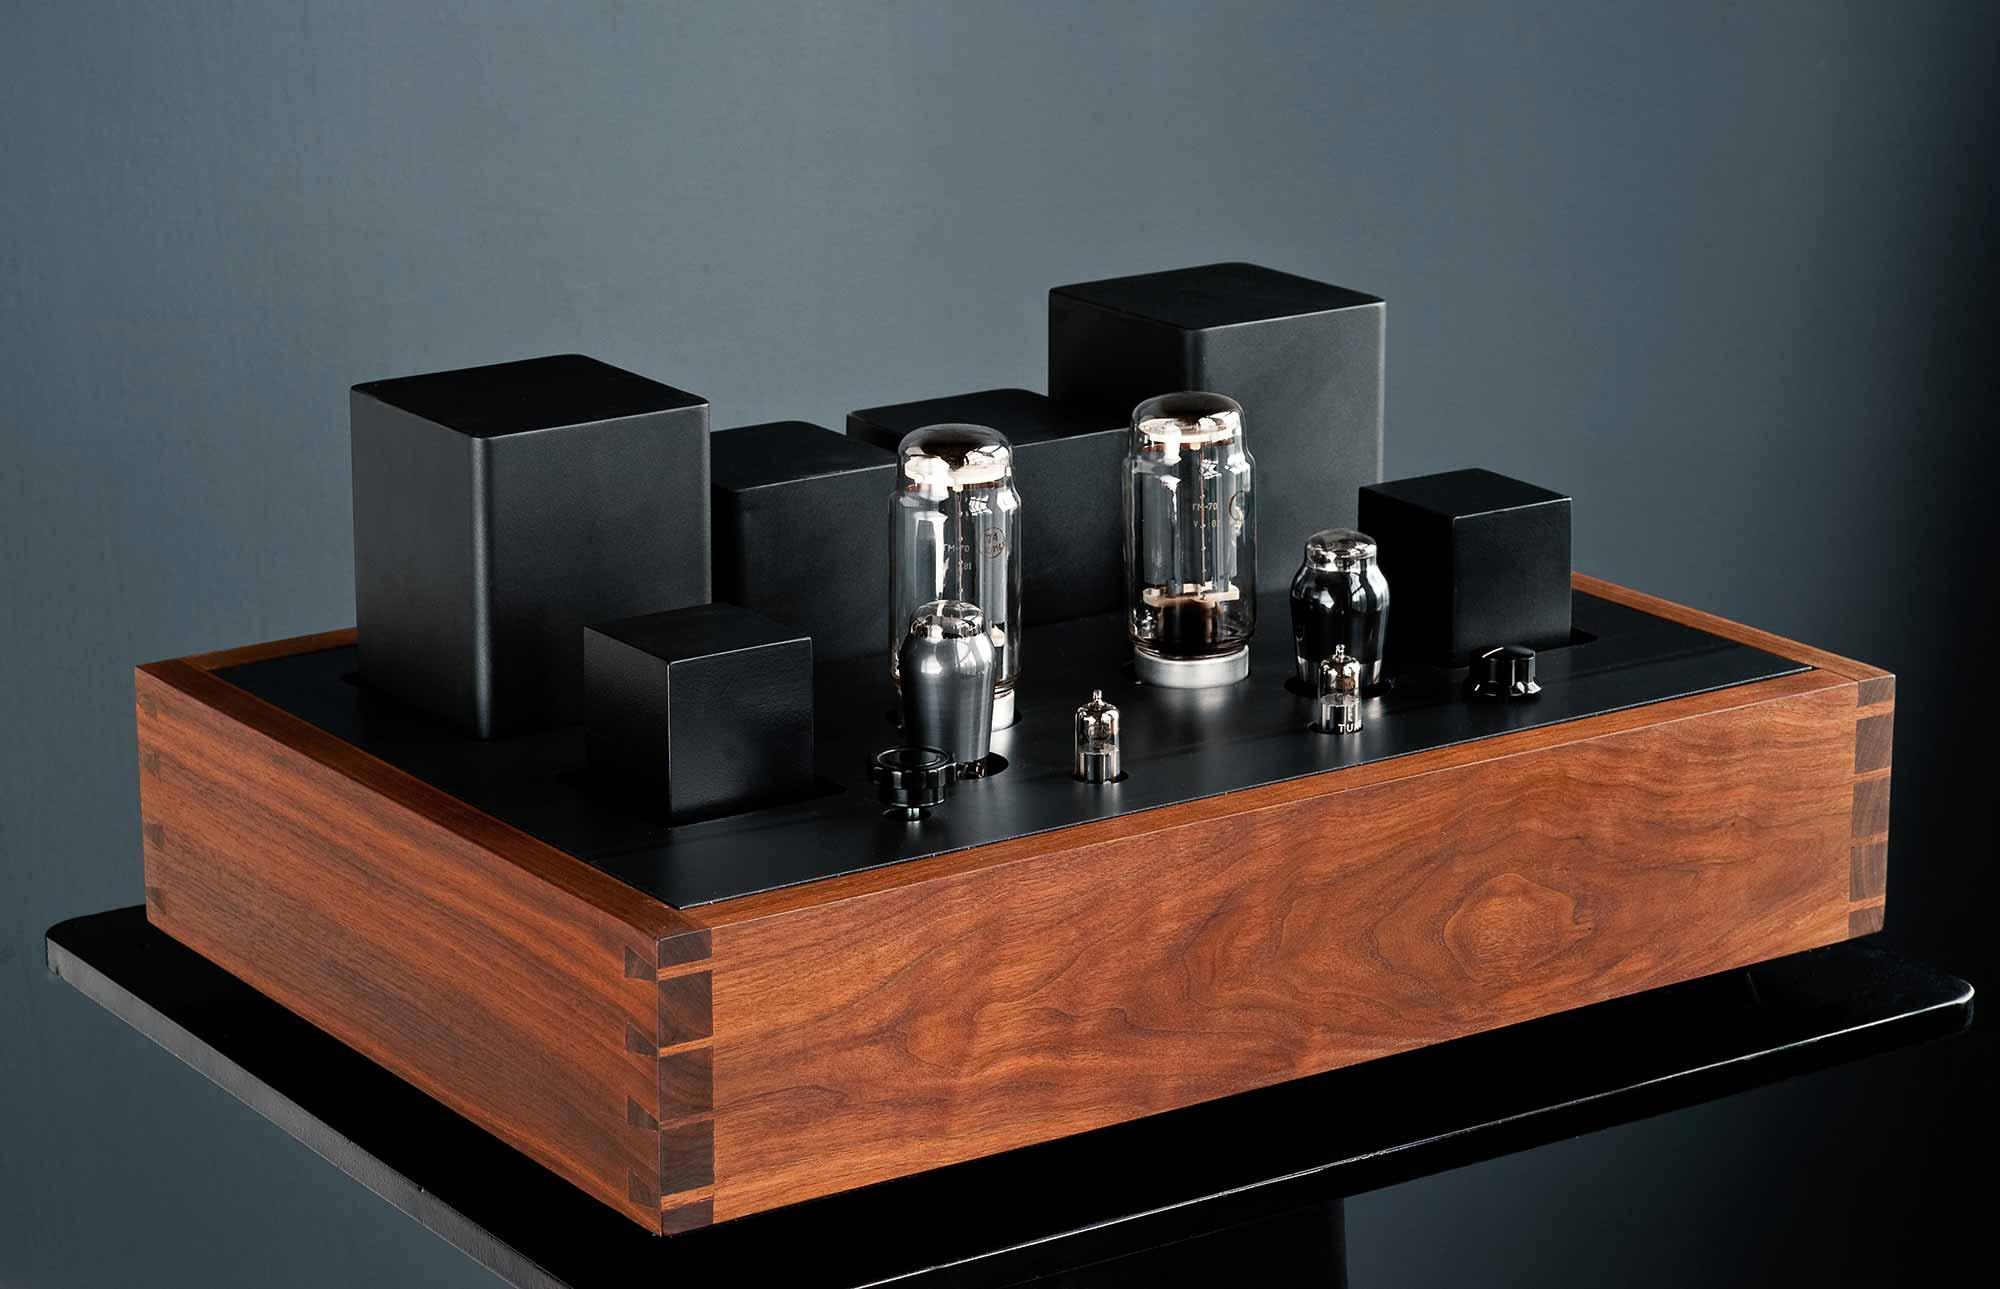 oswalds mill audio hollander oma amplifiers. Black Bedroom Furniture Sets. Home Design Ideas